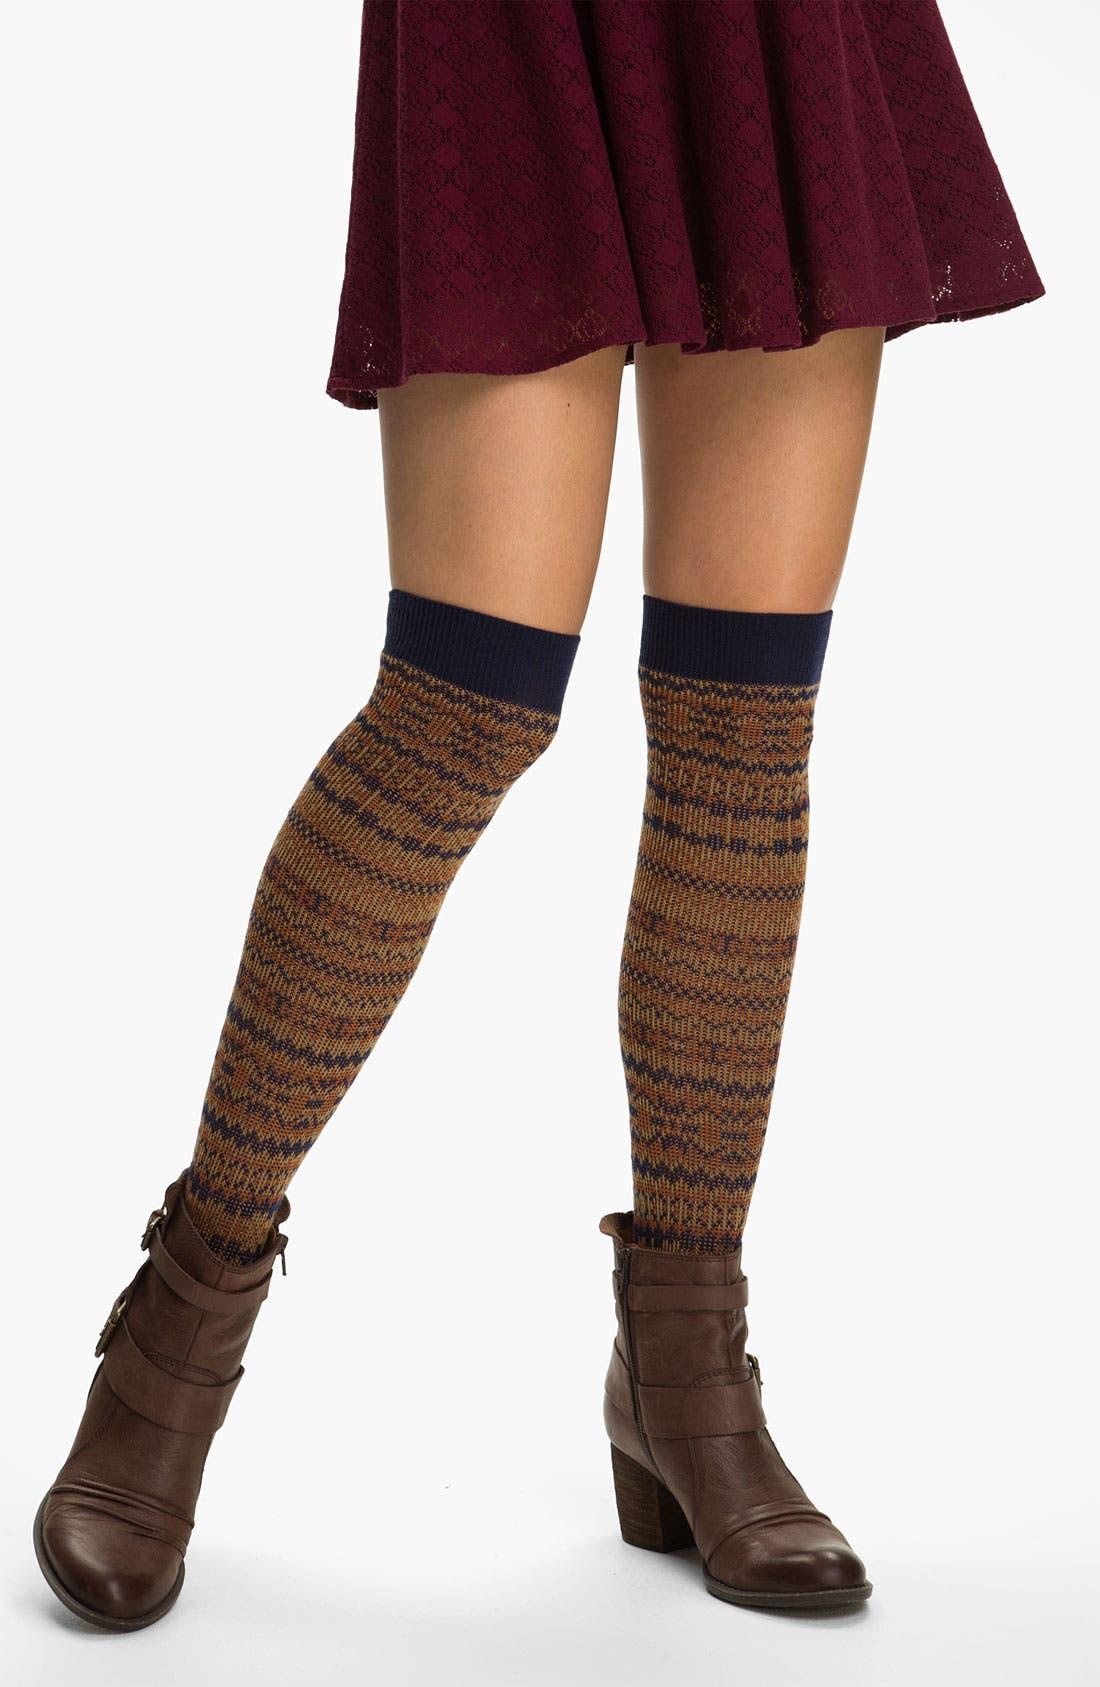 Main Image - Free People 'Holland' Over the Knee Socks